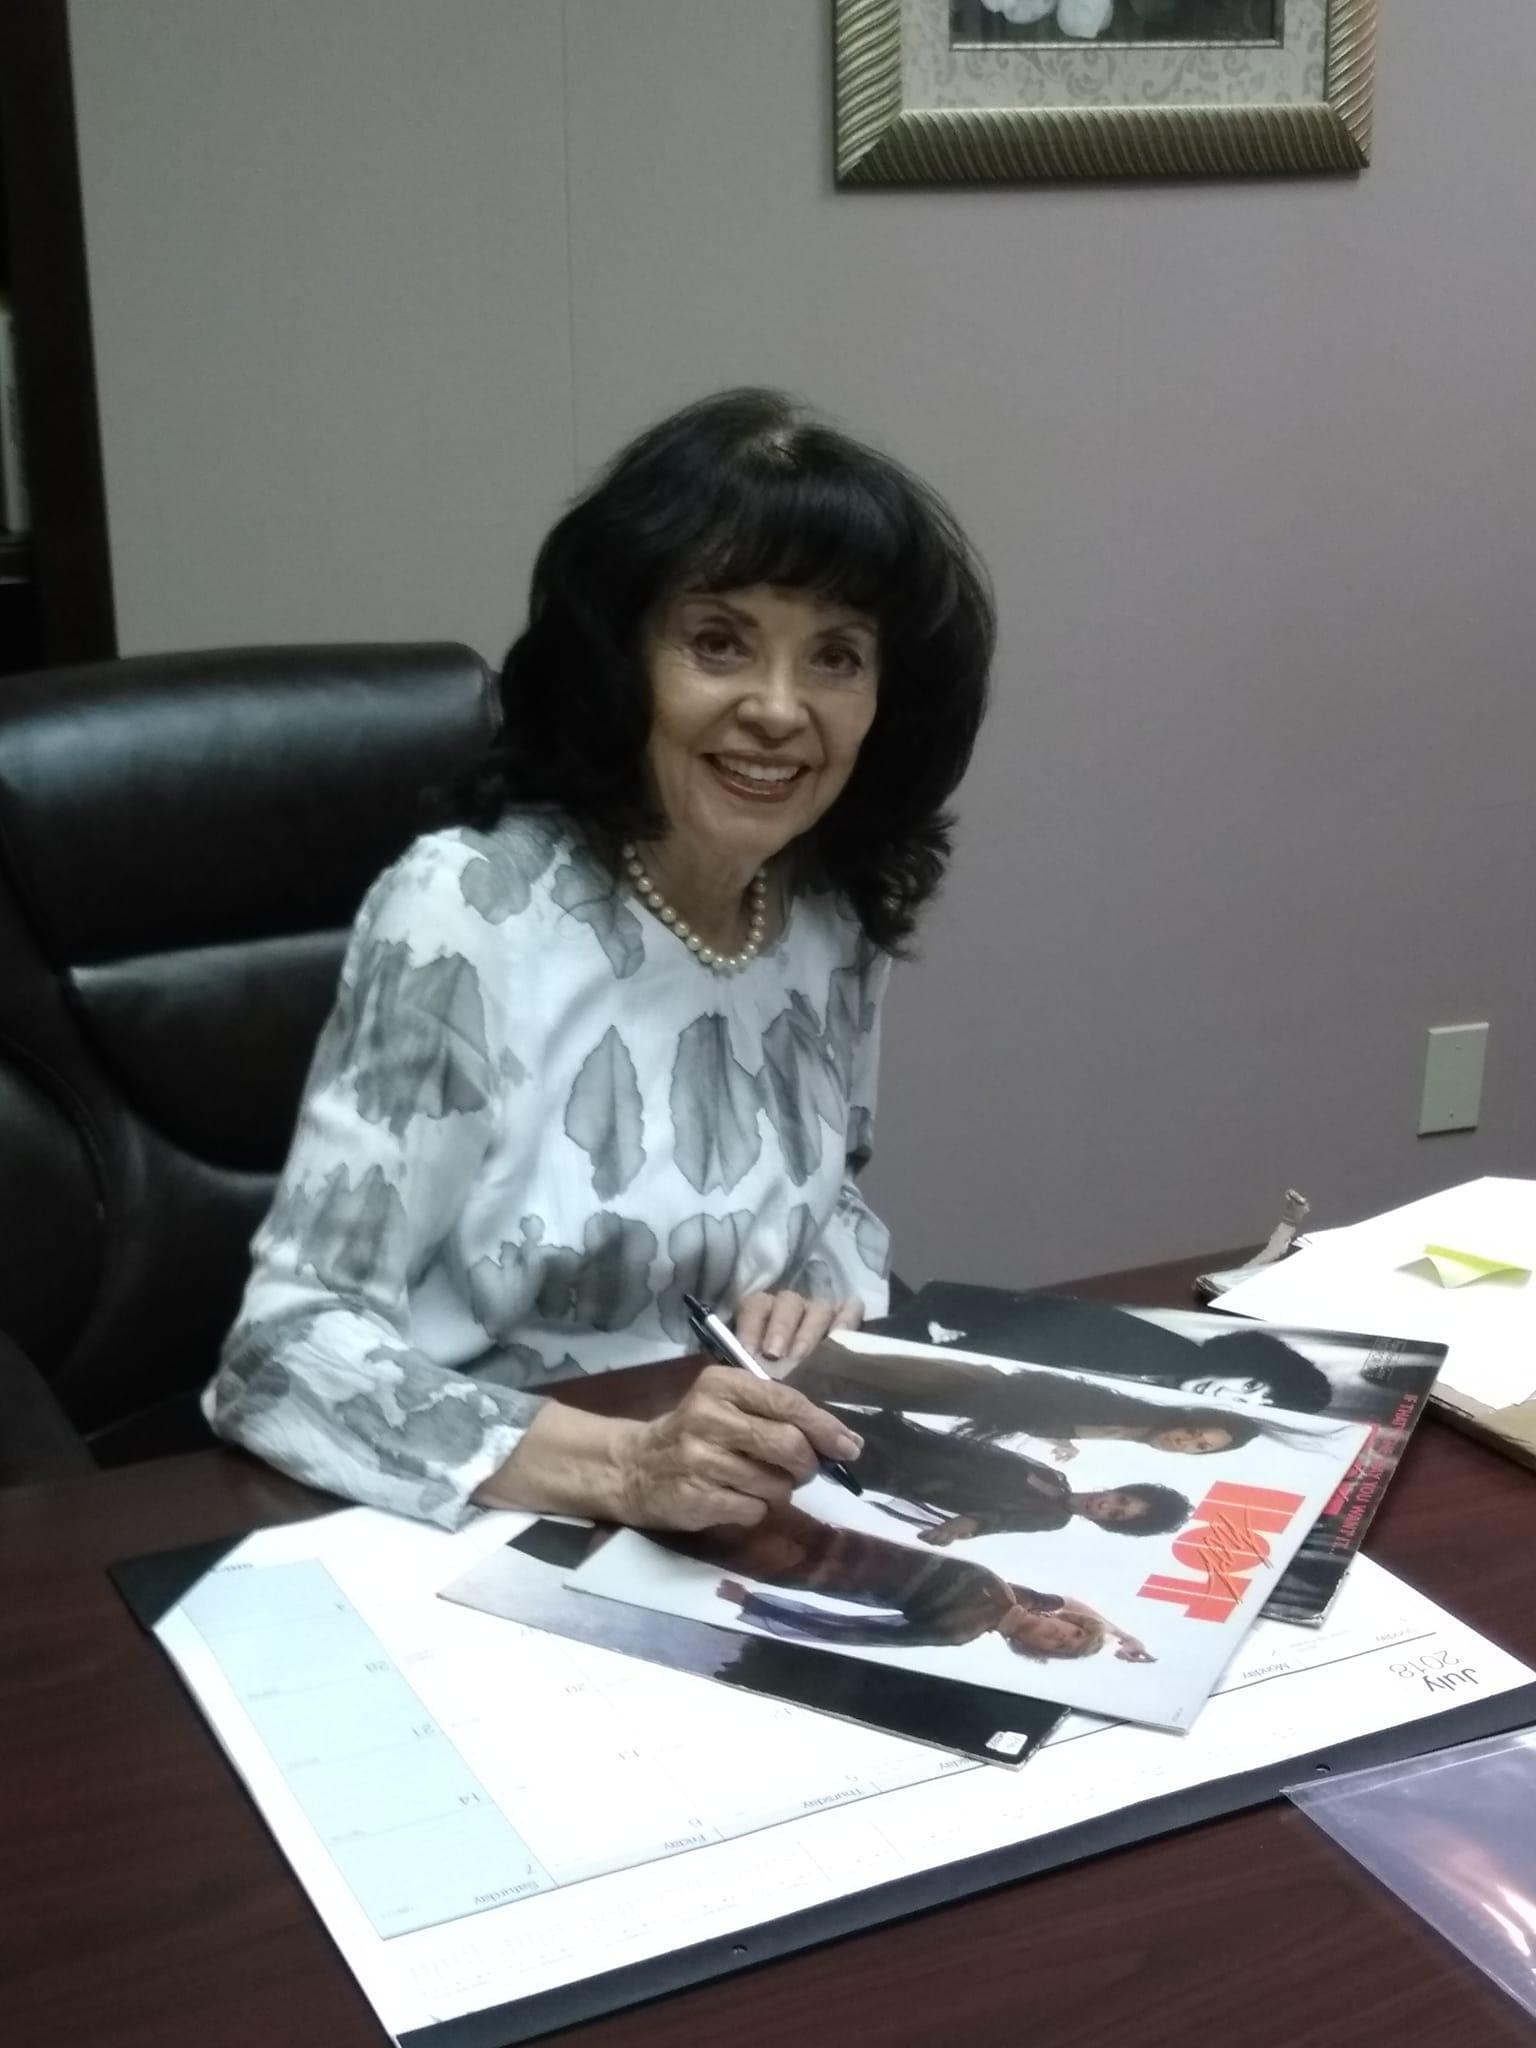 Juanita signing Fan requests 2018